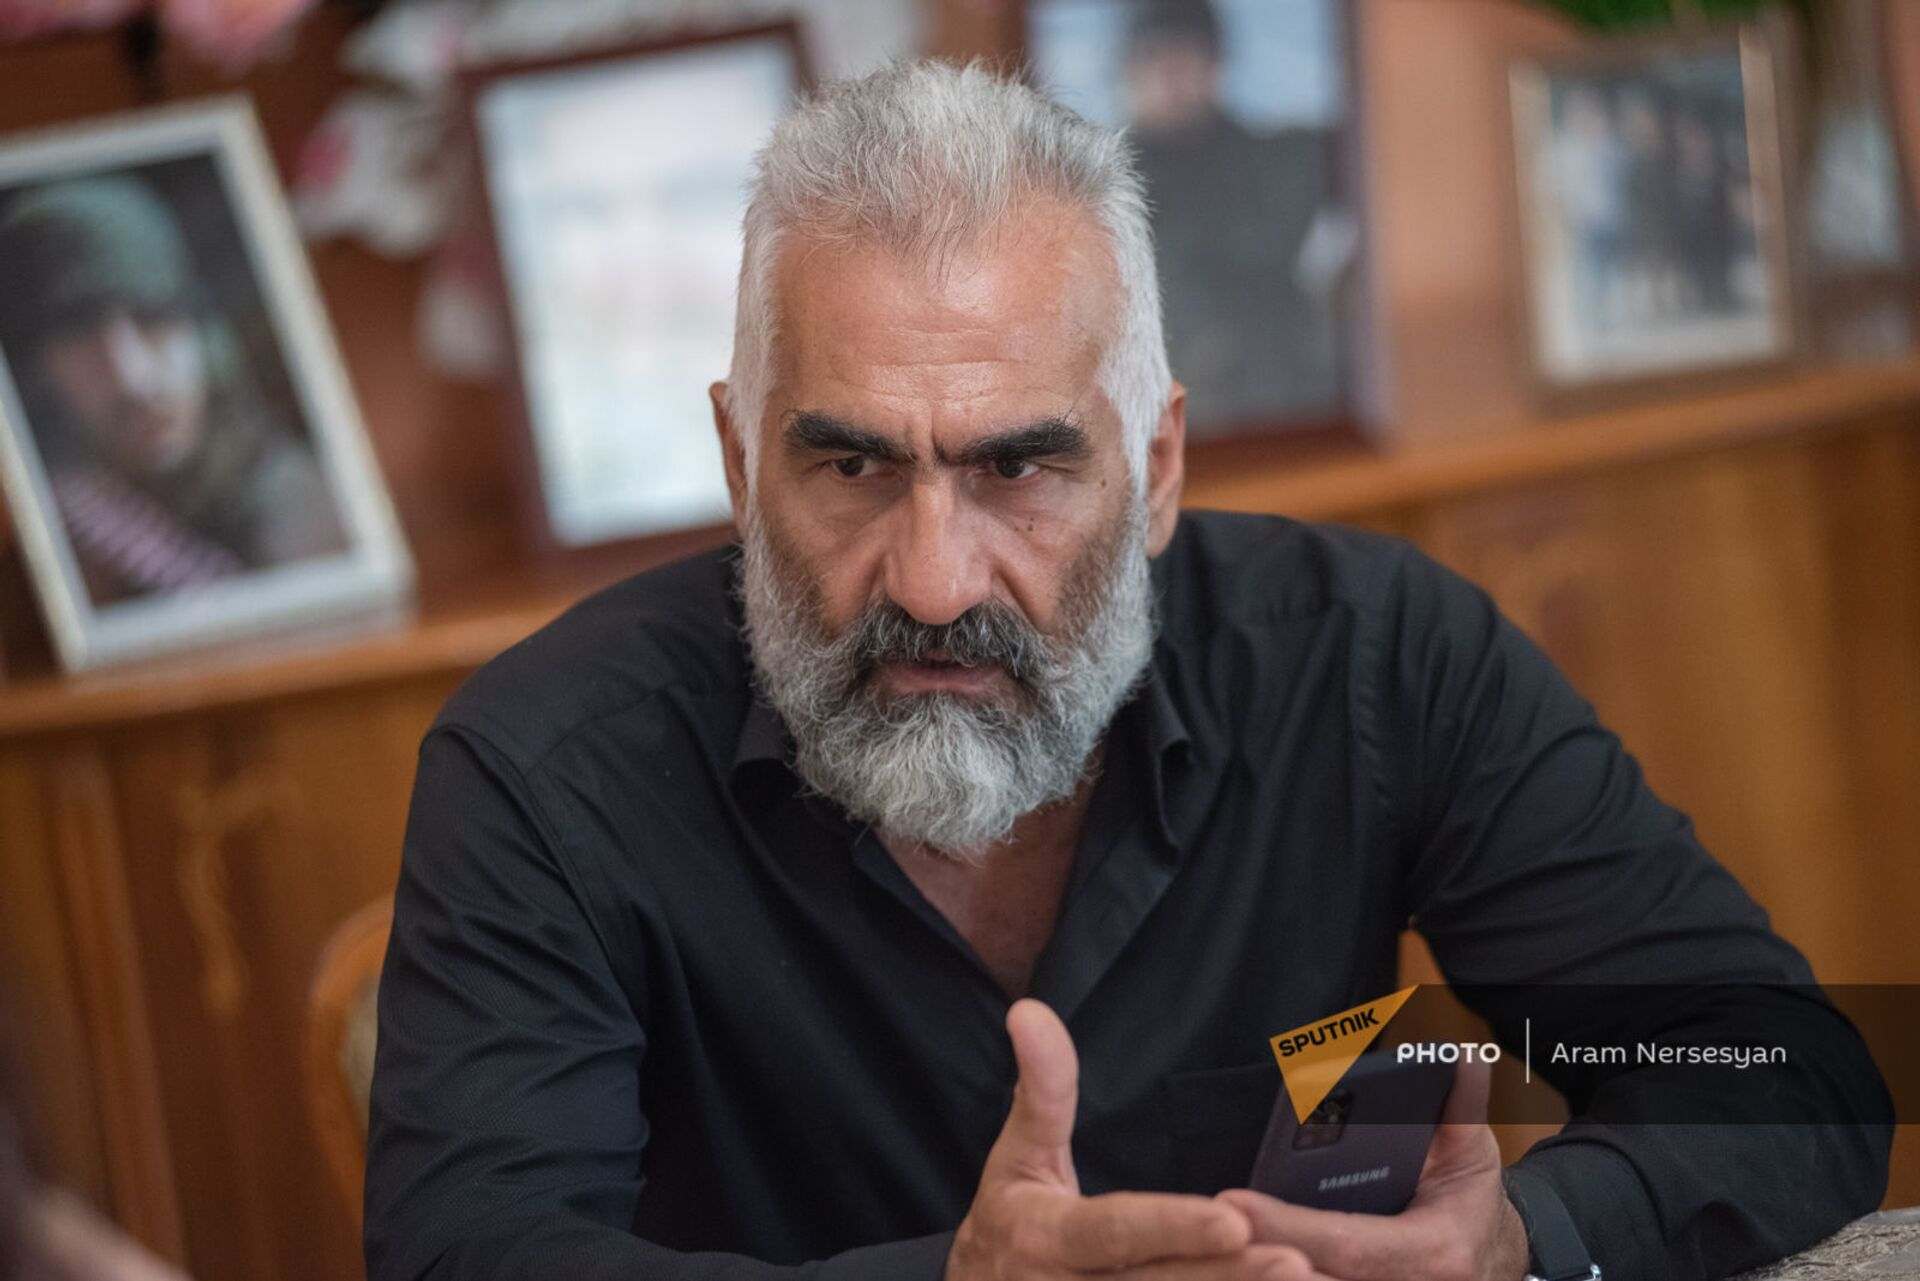 Тигран Марухян, отец погибшего Абрахама Марухяна  - Sputnik Արմենիա, 1920, 14.09.2021